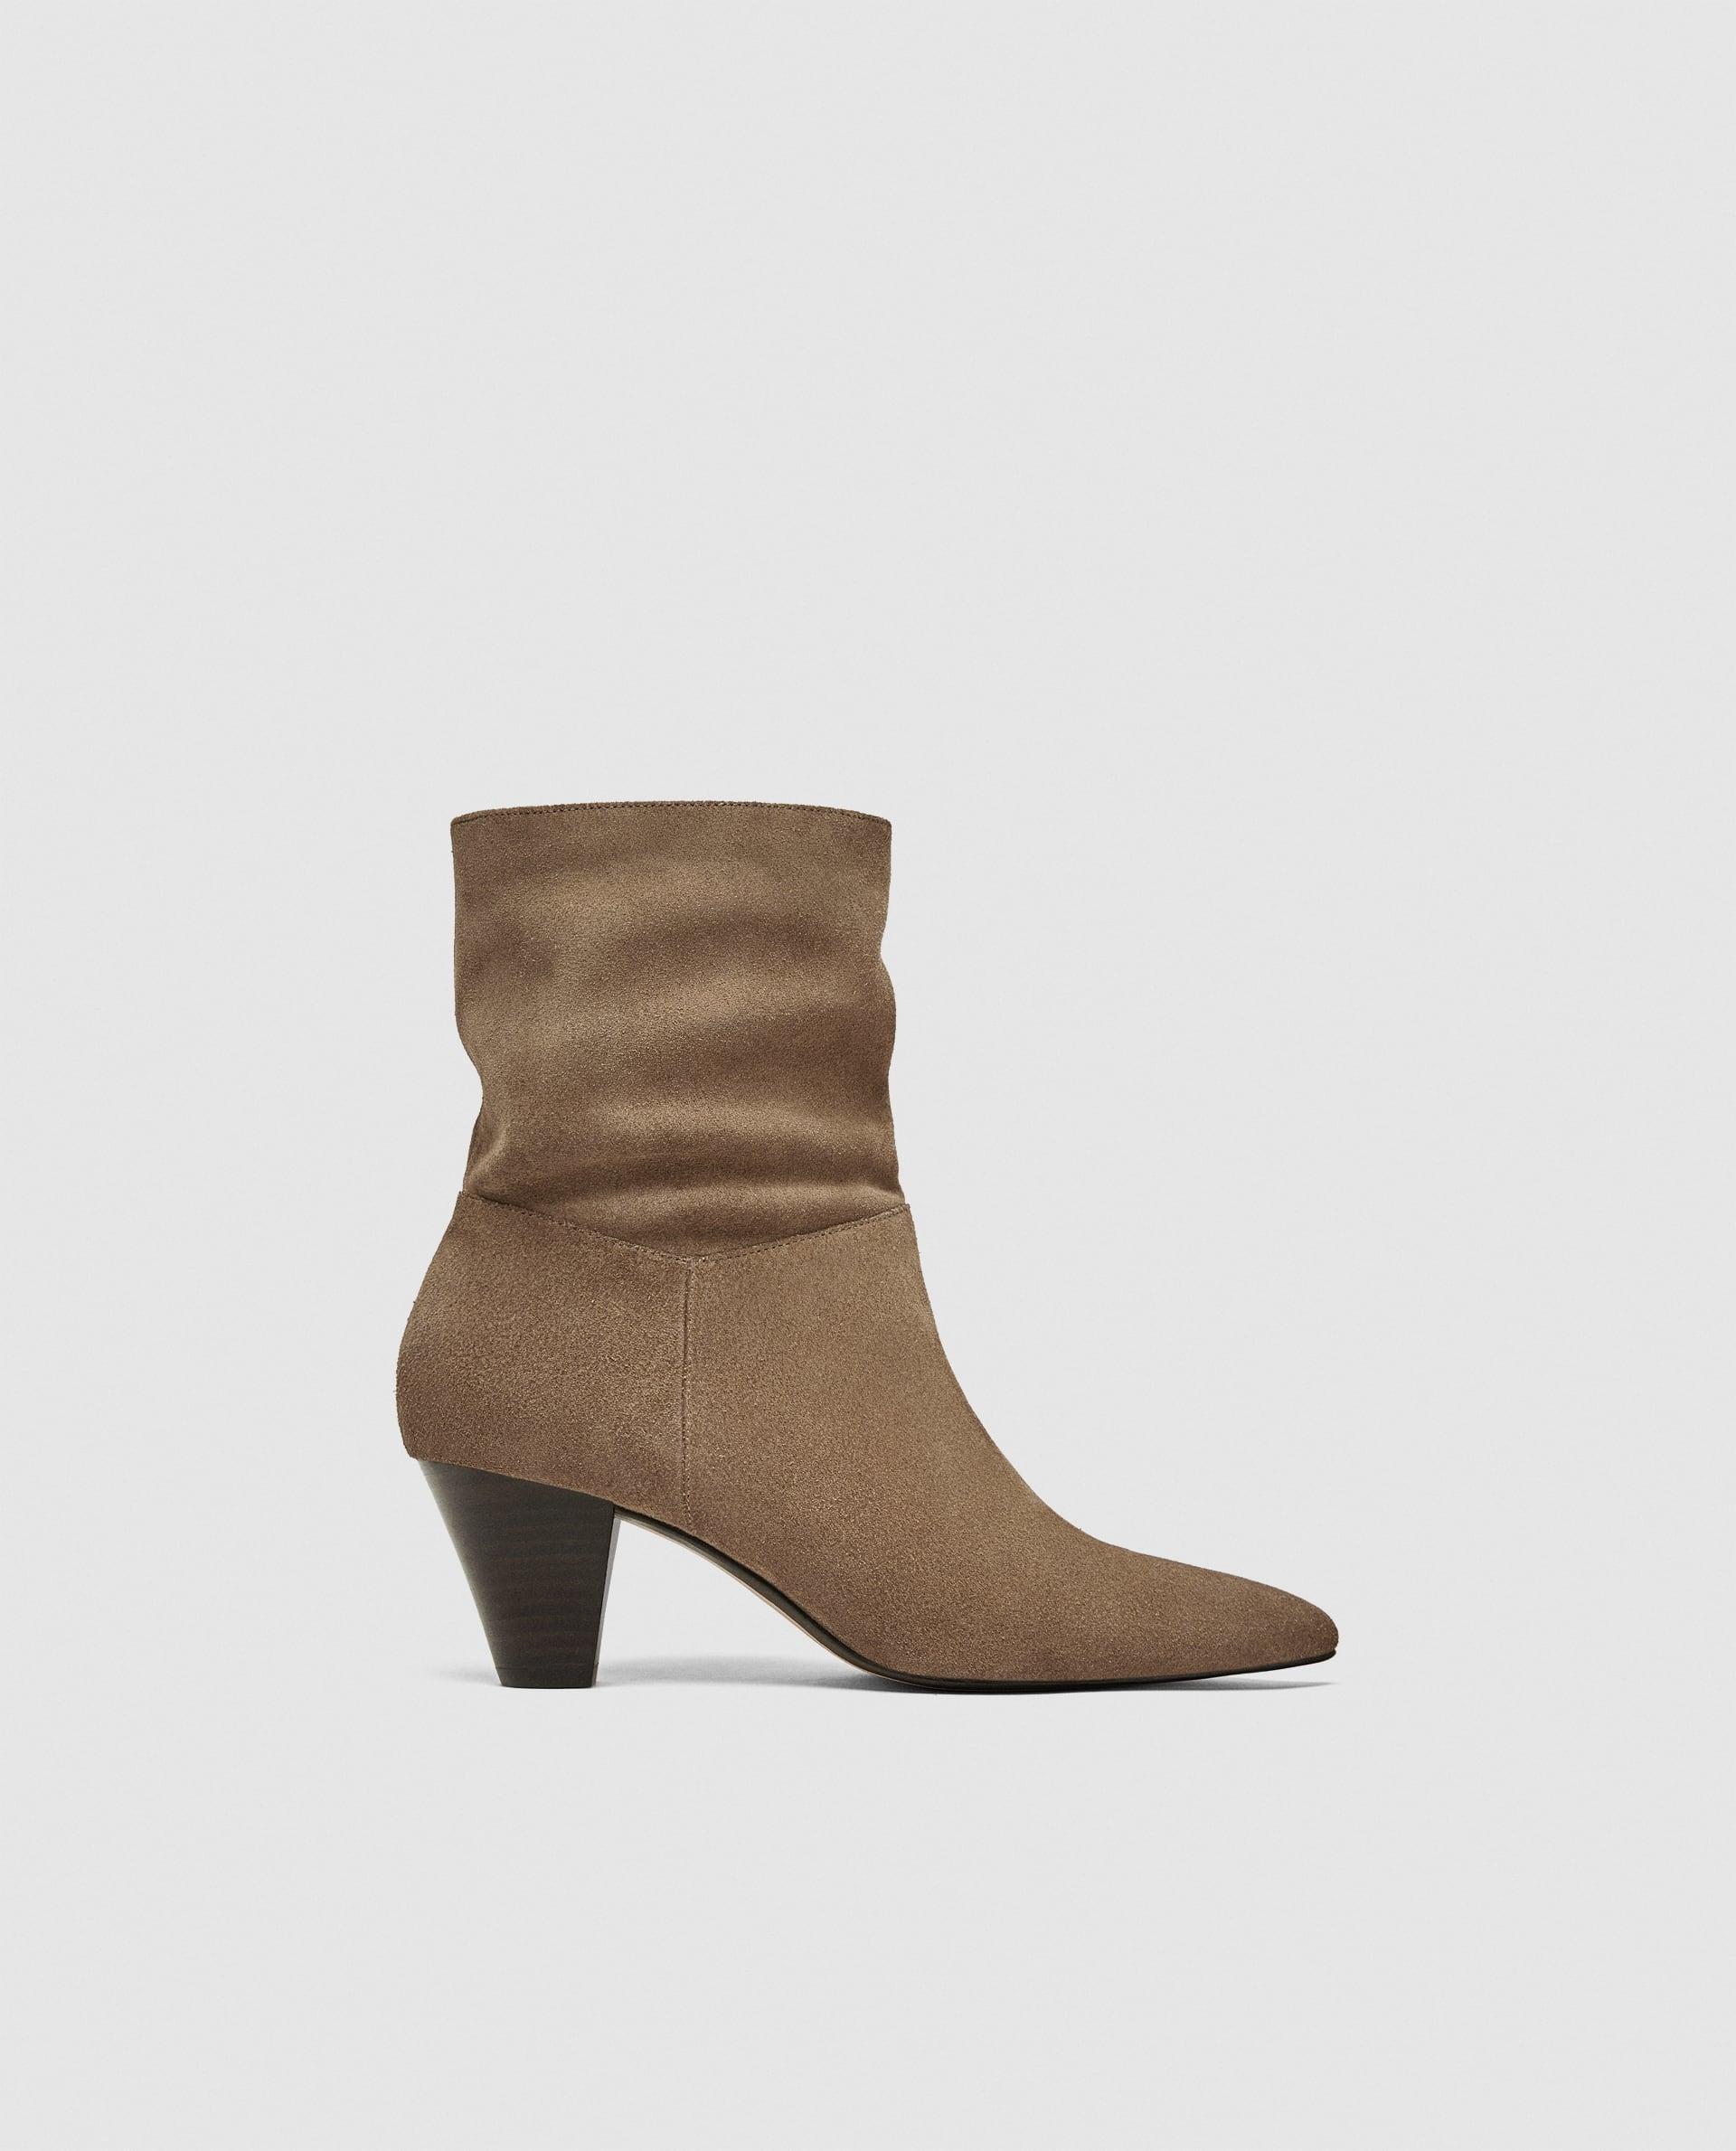 https://www.zara.com/ca/en/leather-high-heel-ankle-boots-p11106301.html?v1=5323305&v2=893503